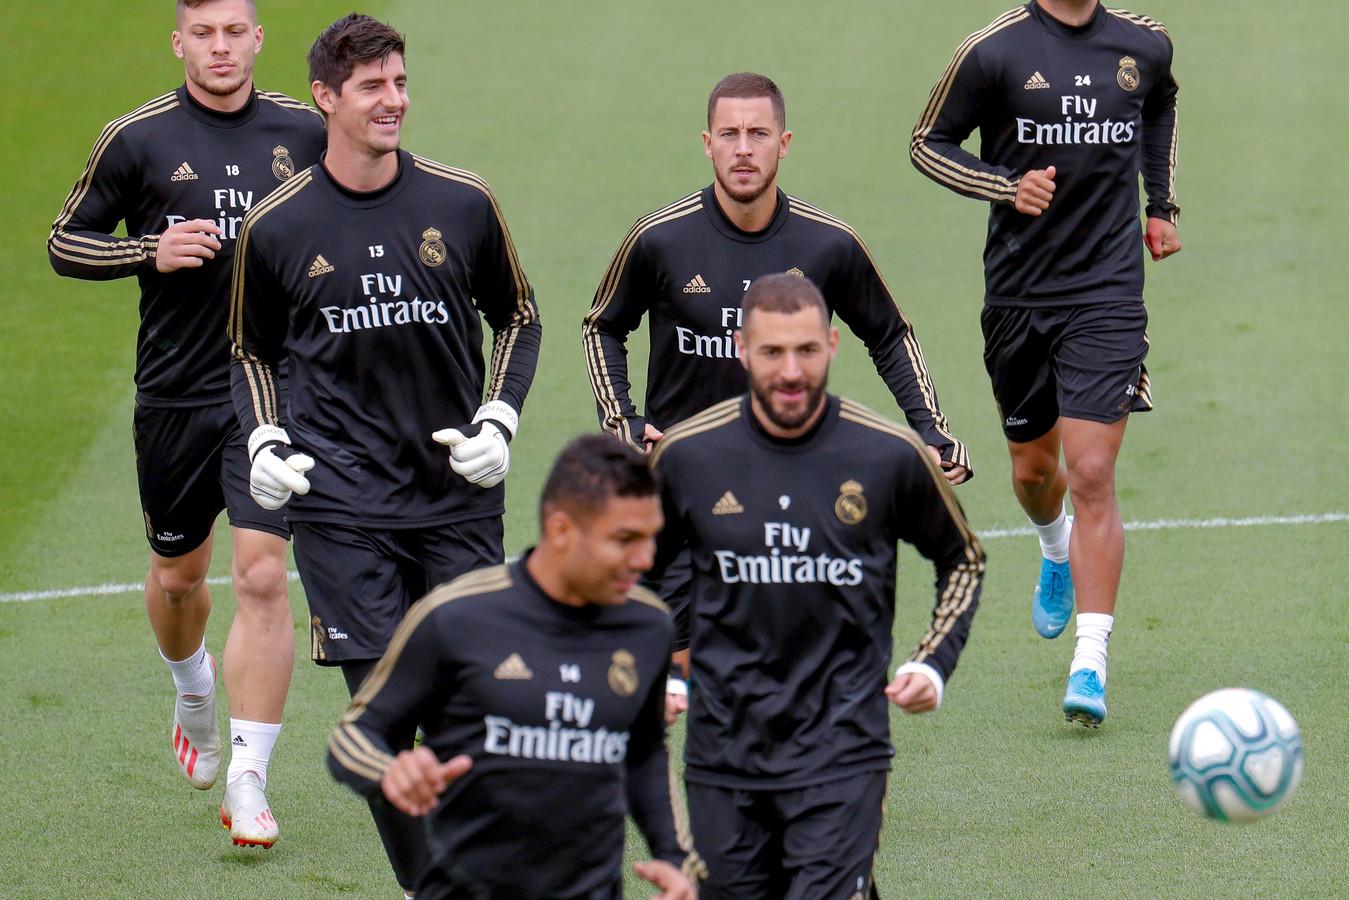 Le Real Madrid affrontera la Real Sociedad en quart de finale de la Coupe du Roi.